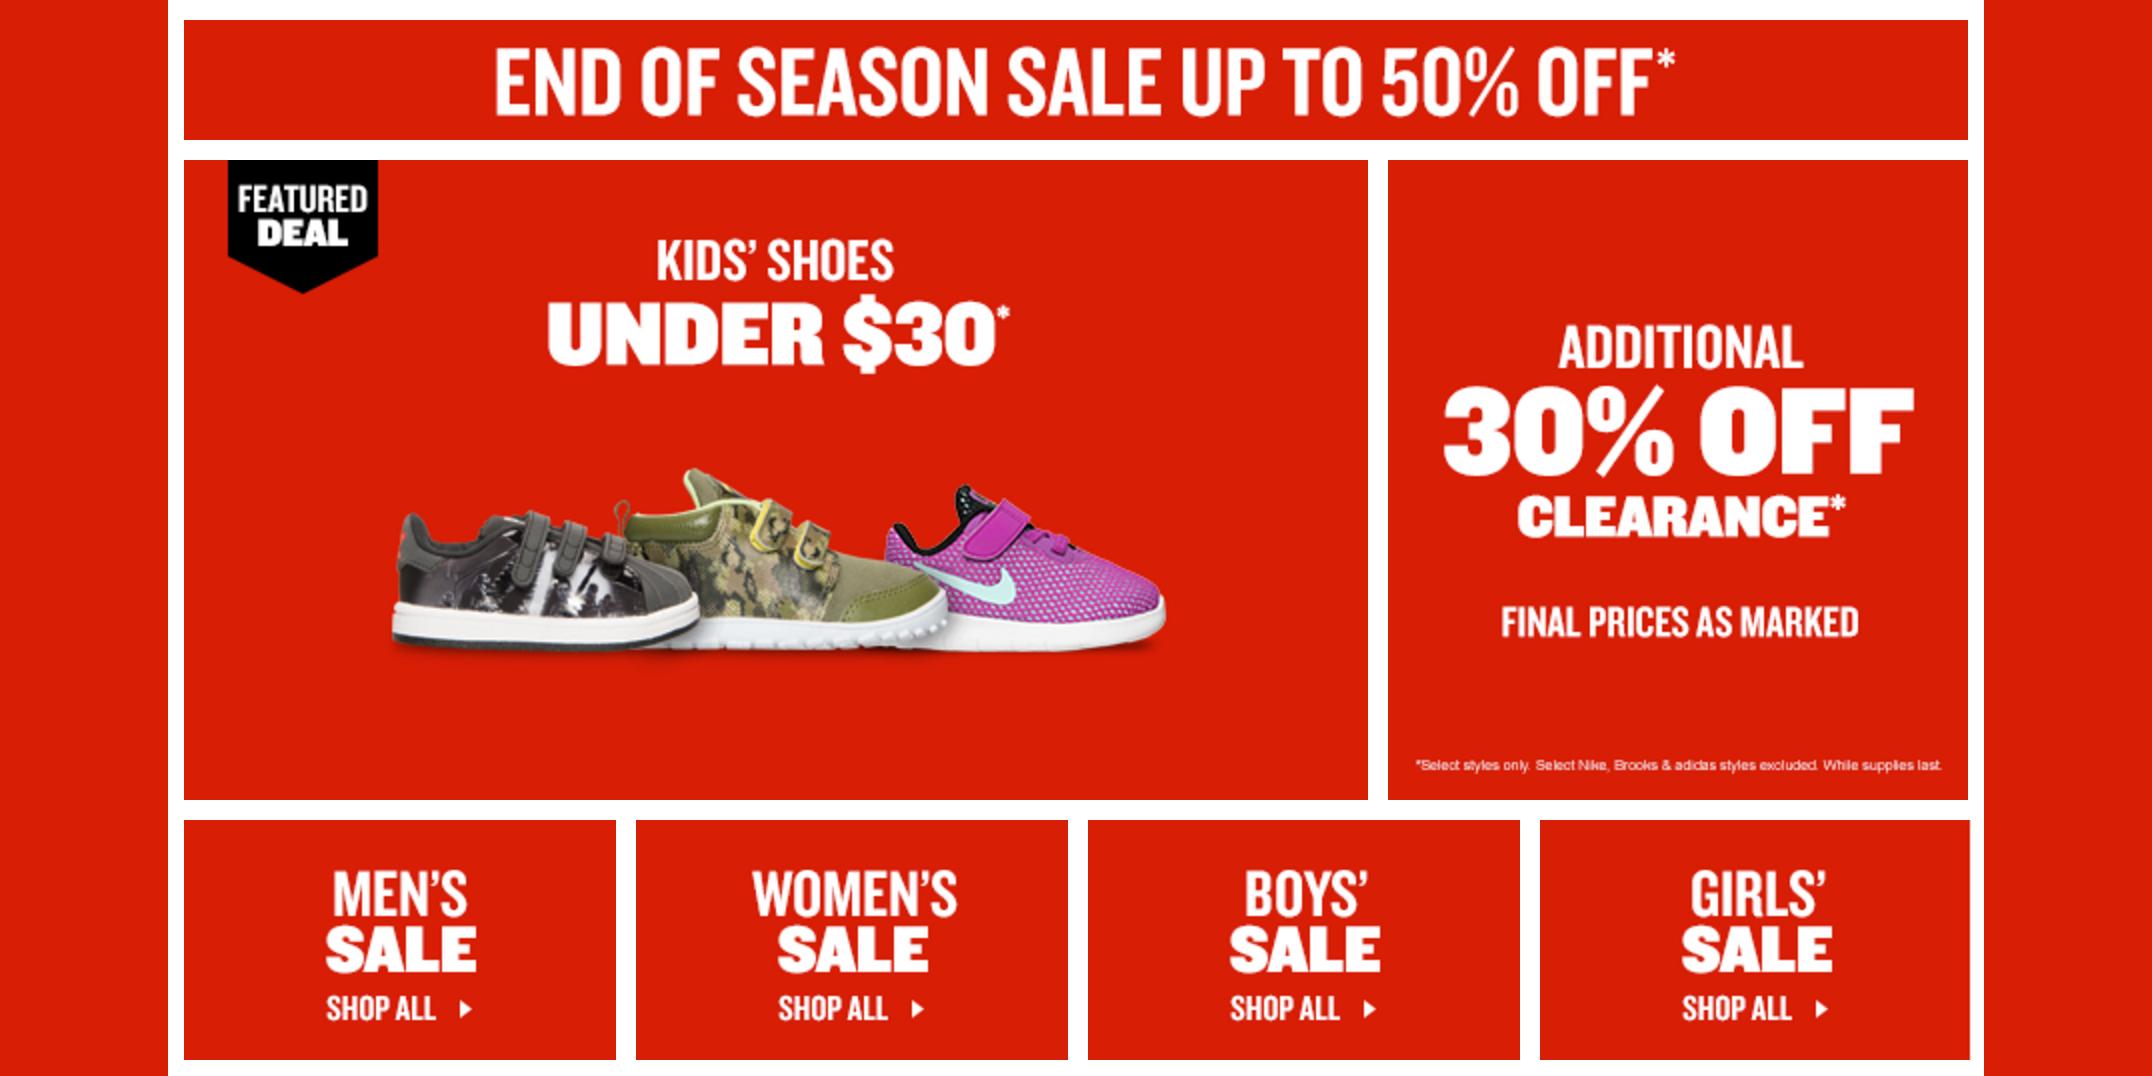 Season Sale has Nike Running Shoes